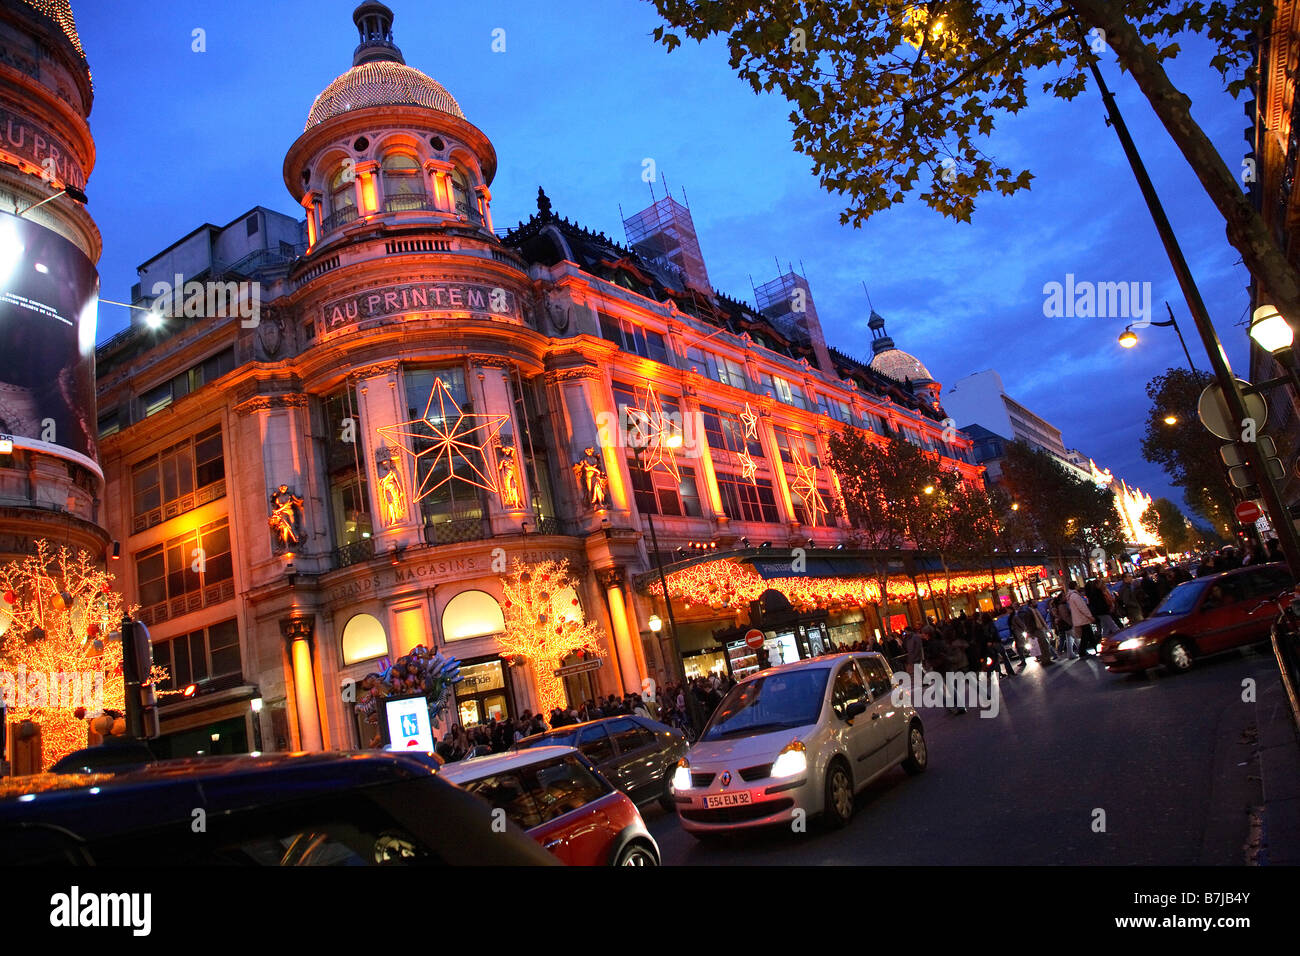 Paris france printemps department store on boulevard haussmann at stock photo - Meubles printemps haussmann ...